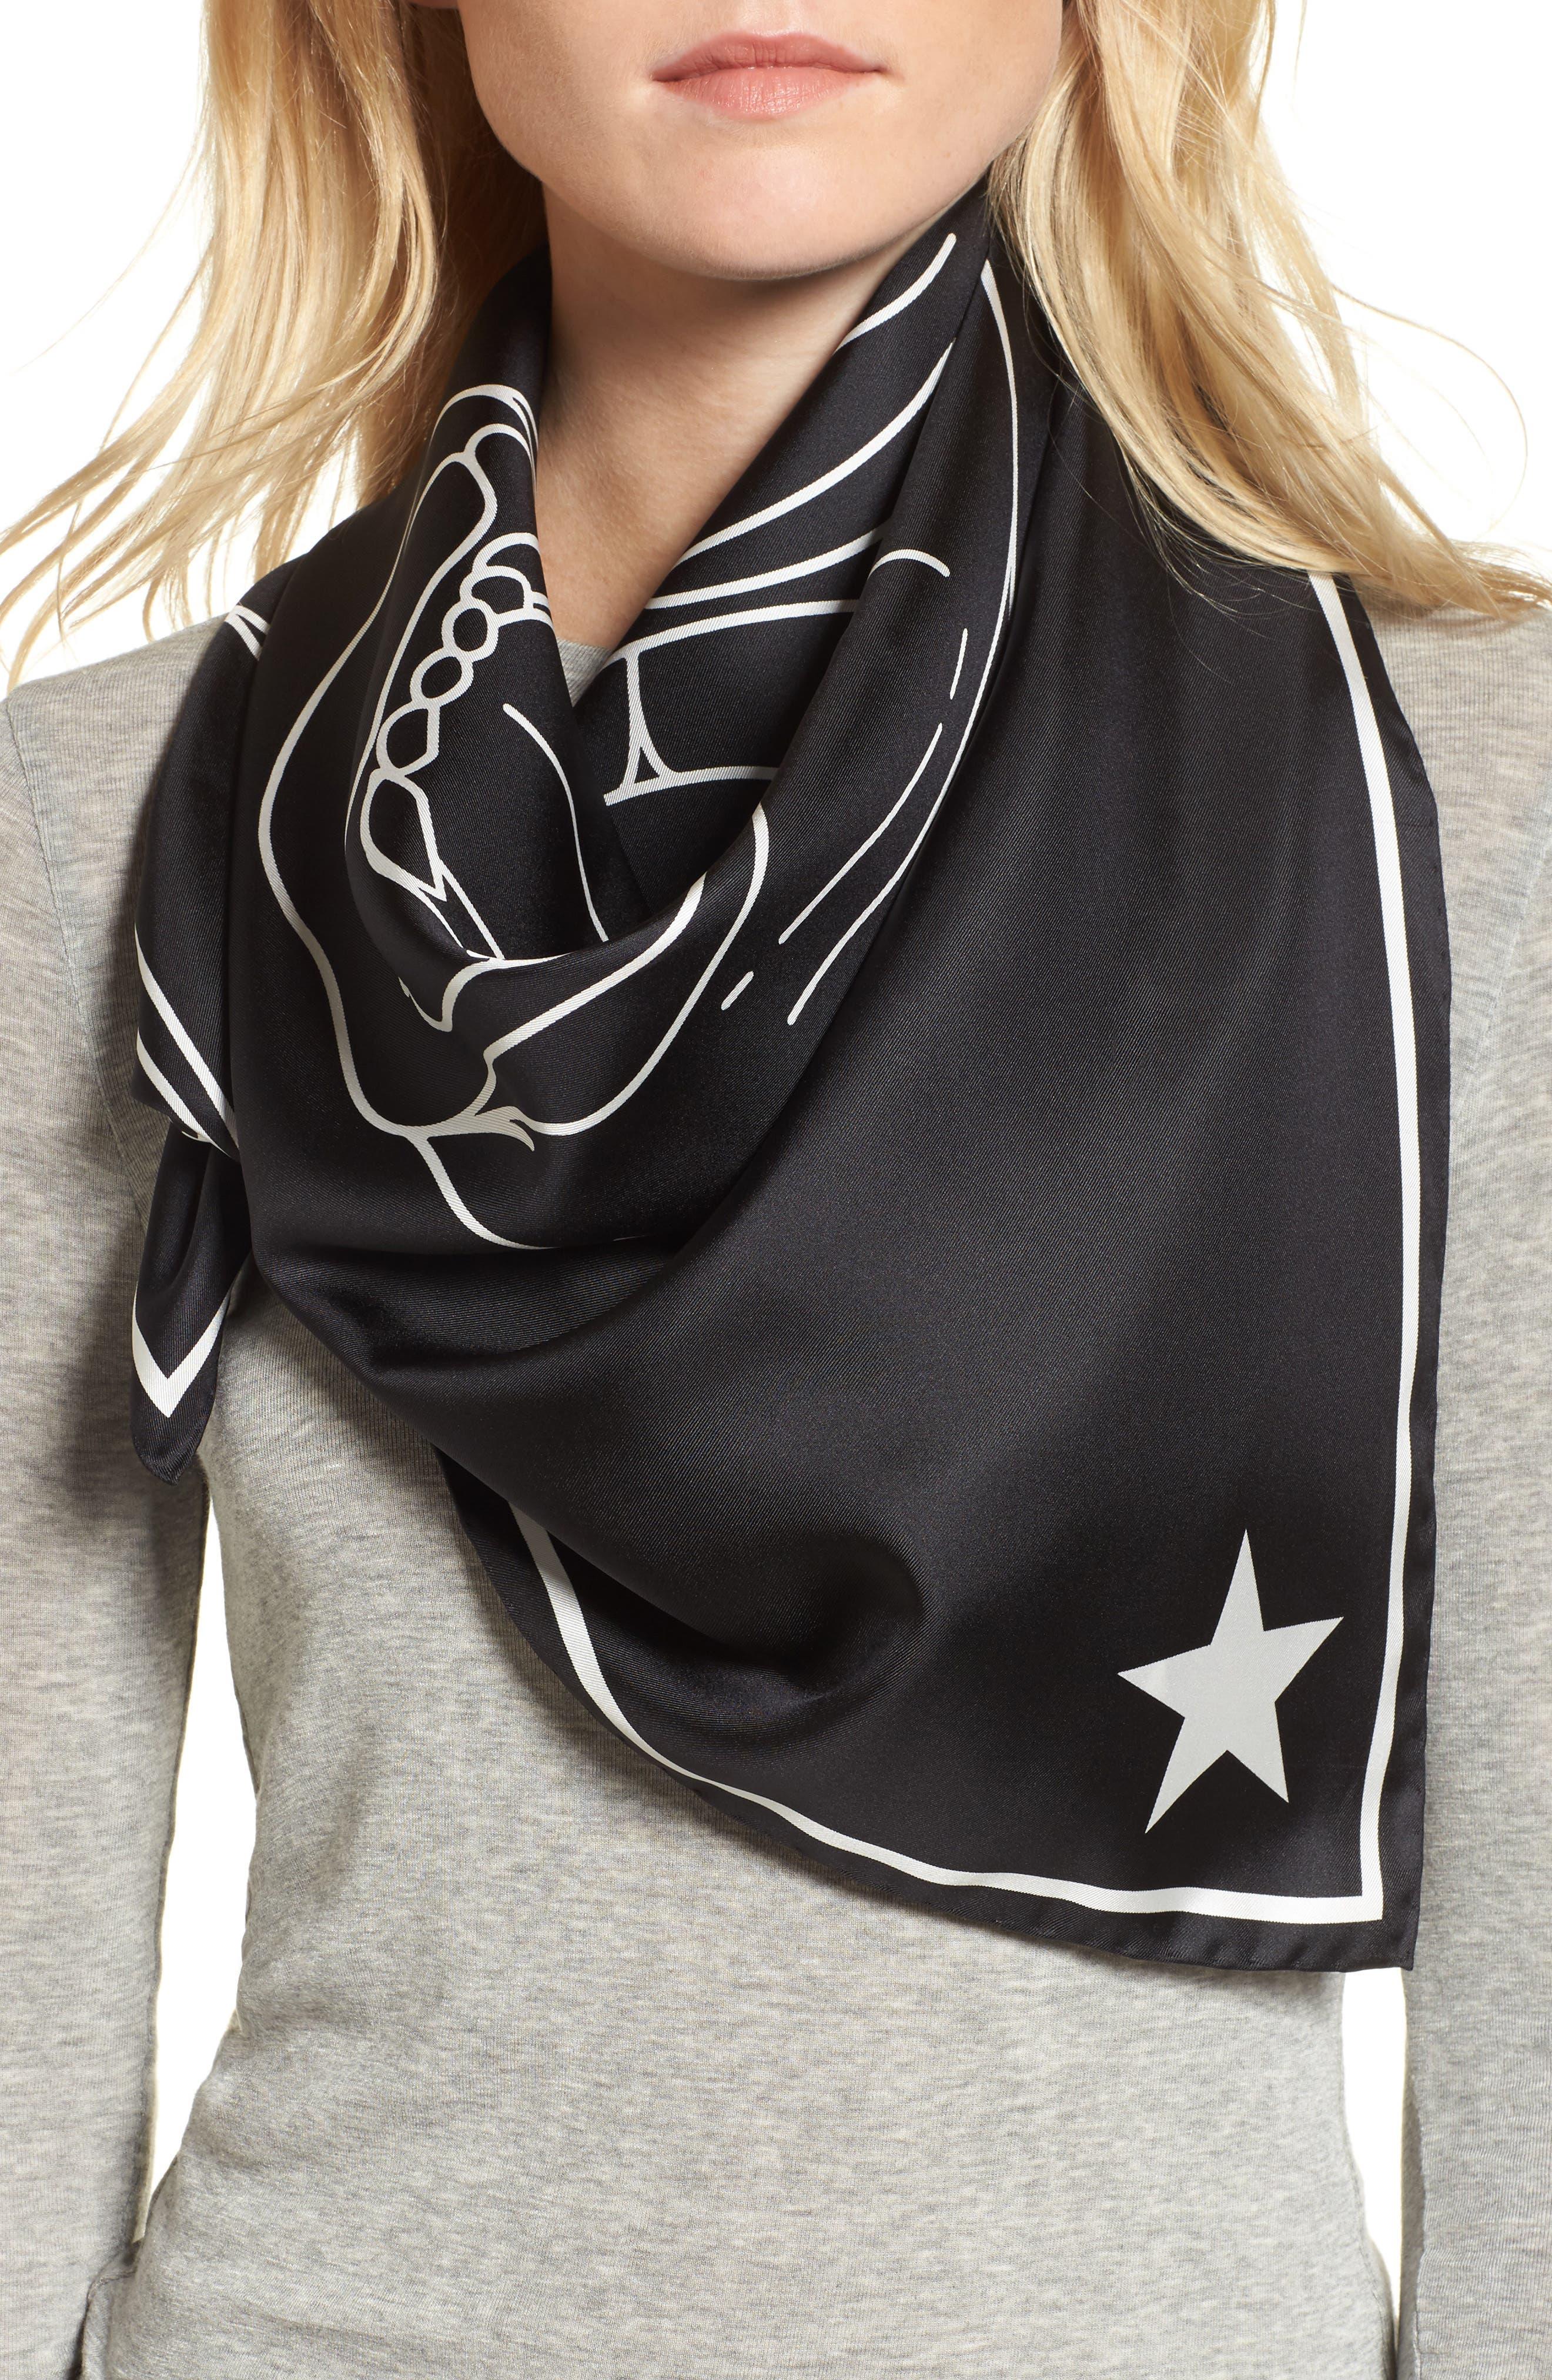 Rottweiler Silk Twill Scarf,                             Alternate thumbnail 2, color,                             Black/White